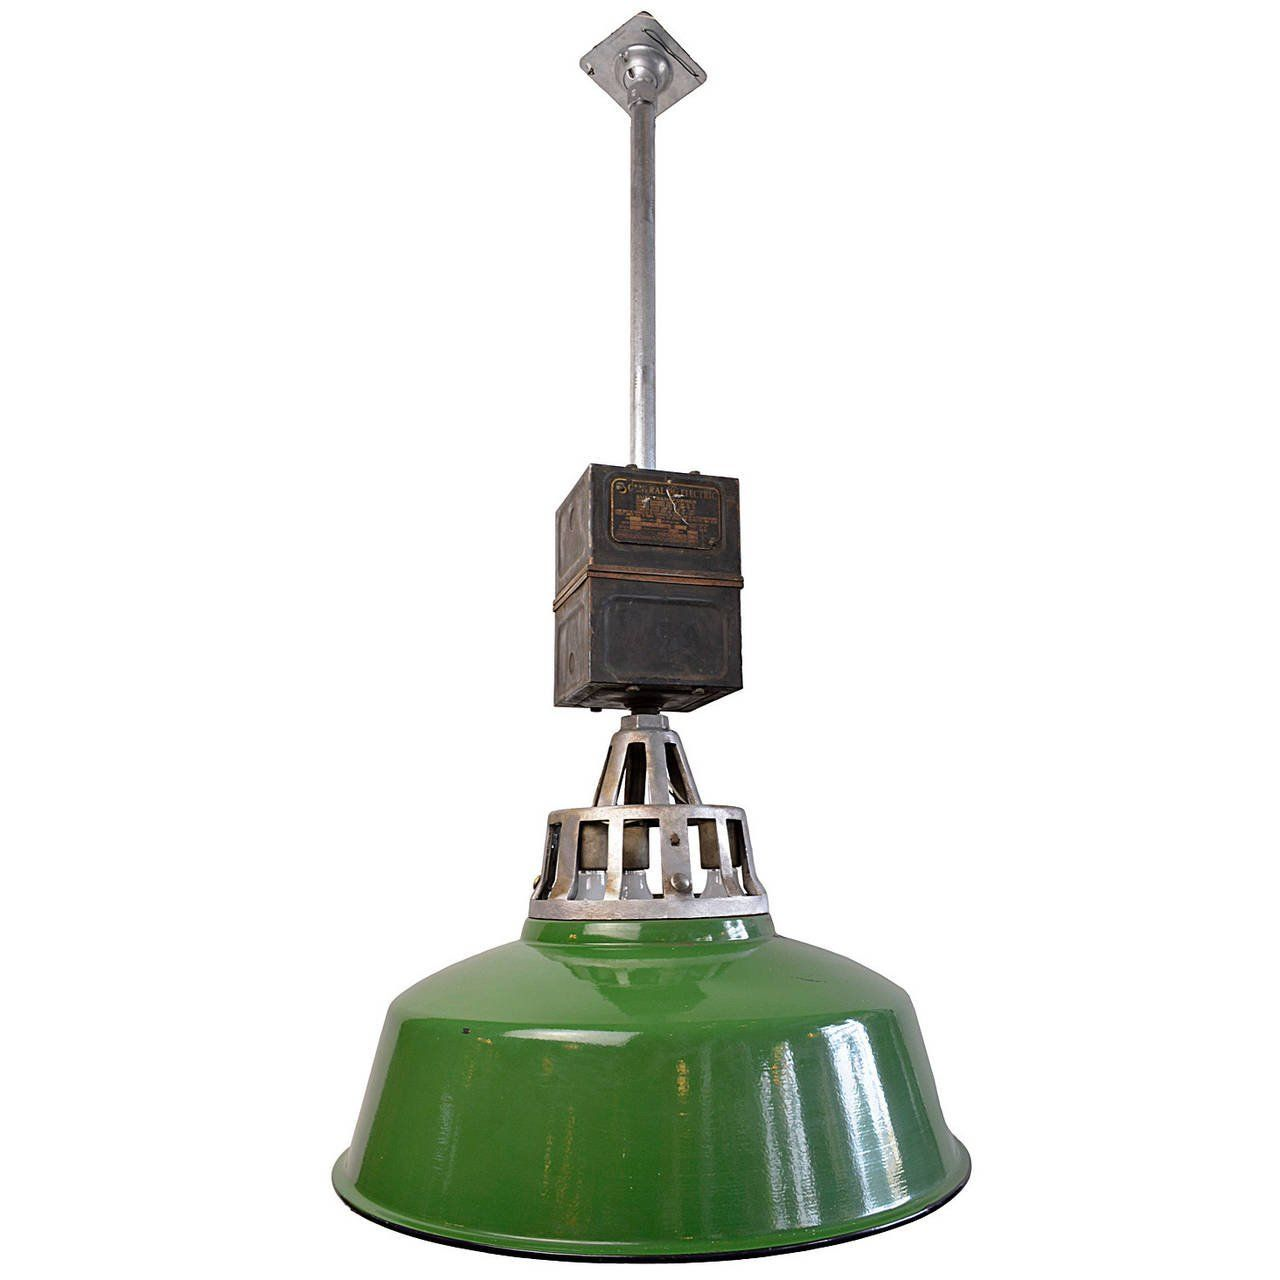 Original Warehouse Pendant Light: Green Enamel Warehouse Fixture With Original Transformer